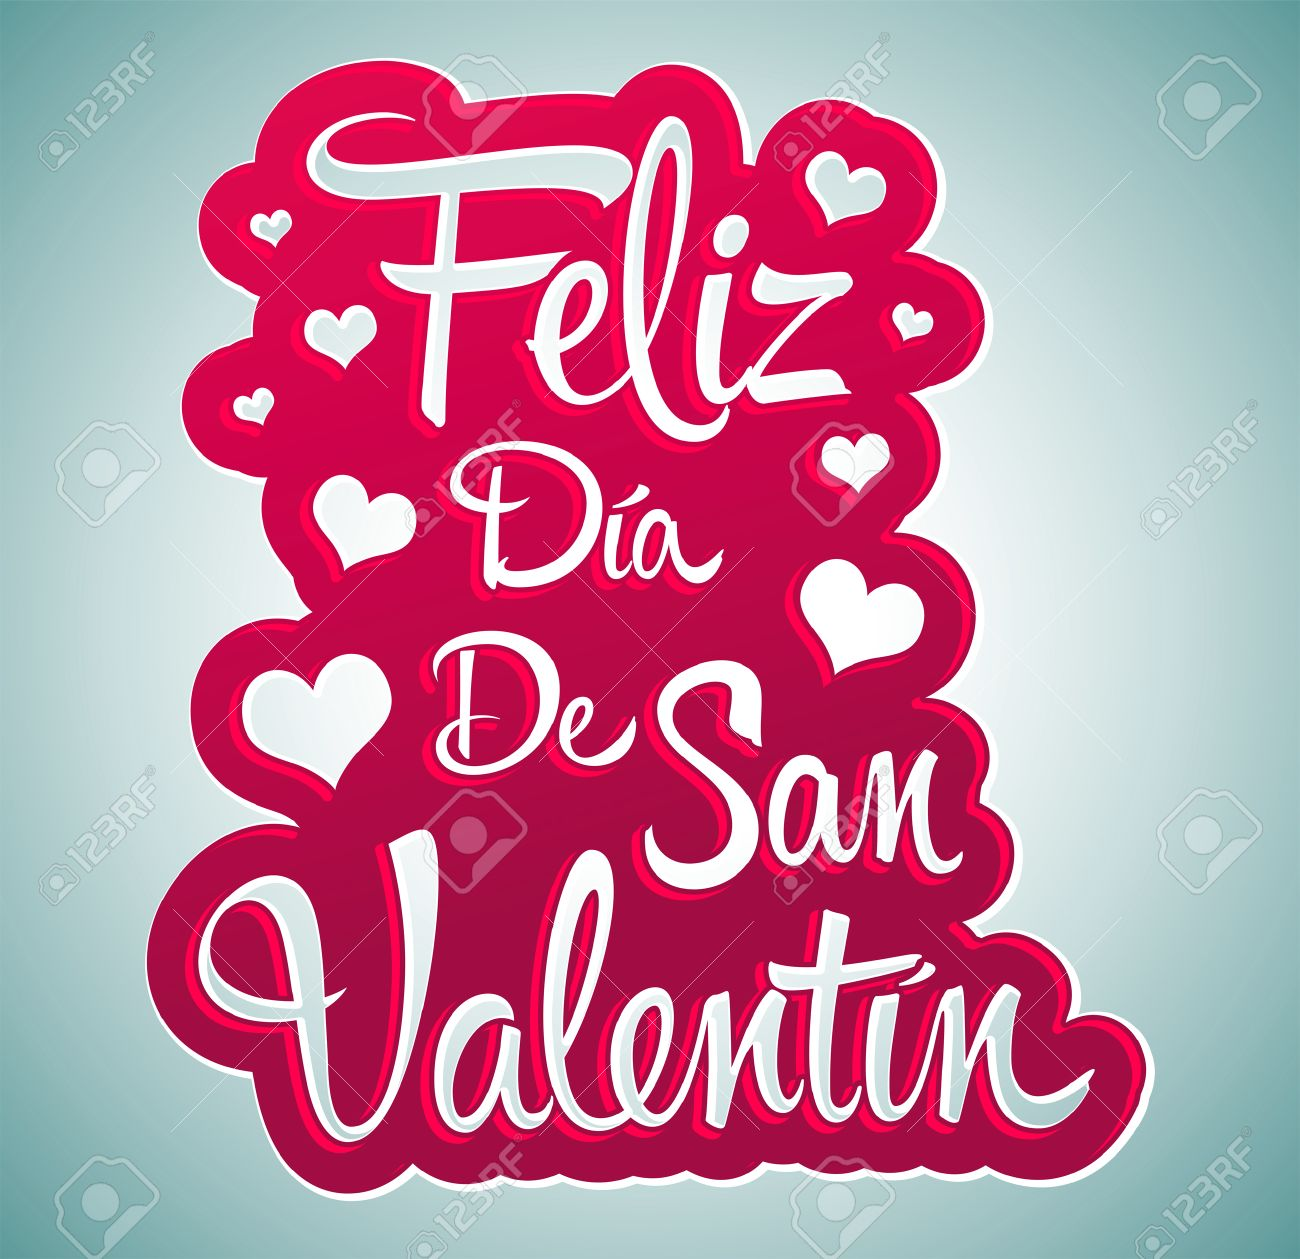 Feliz Dia De San Valentin Happy Valentines Day Spanish Text